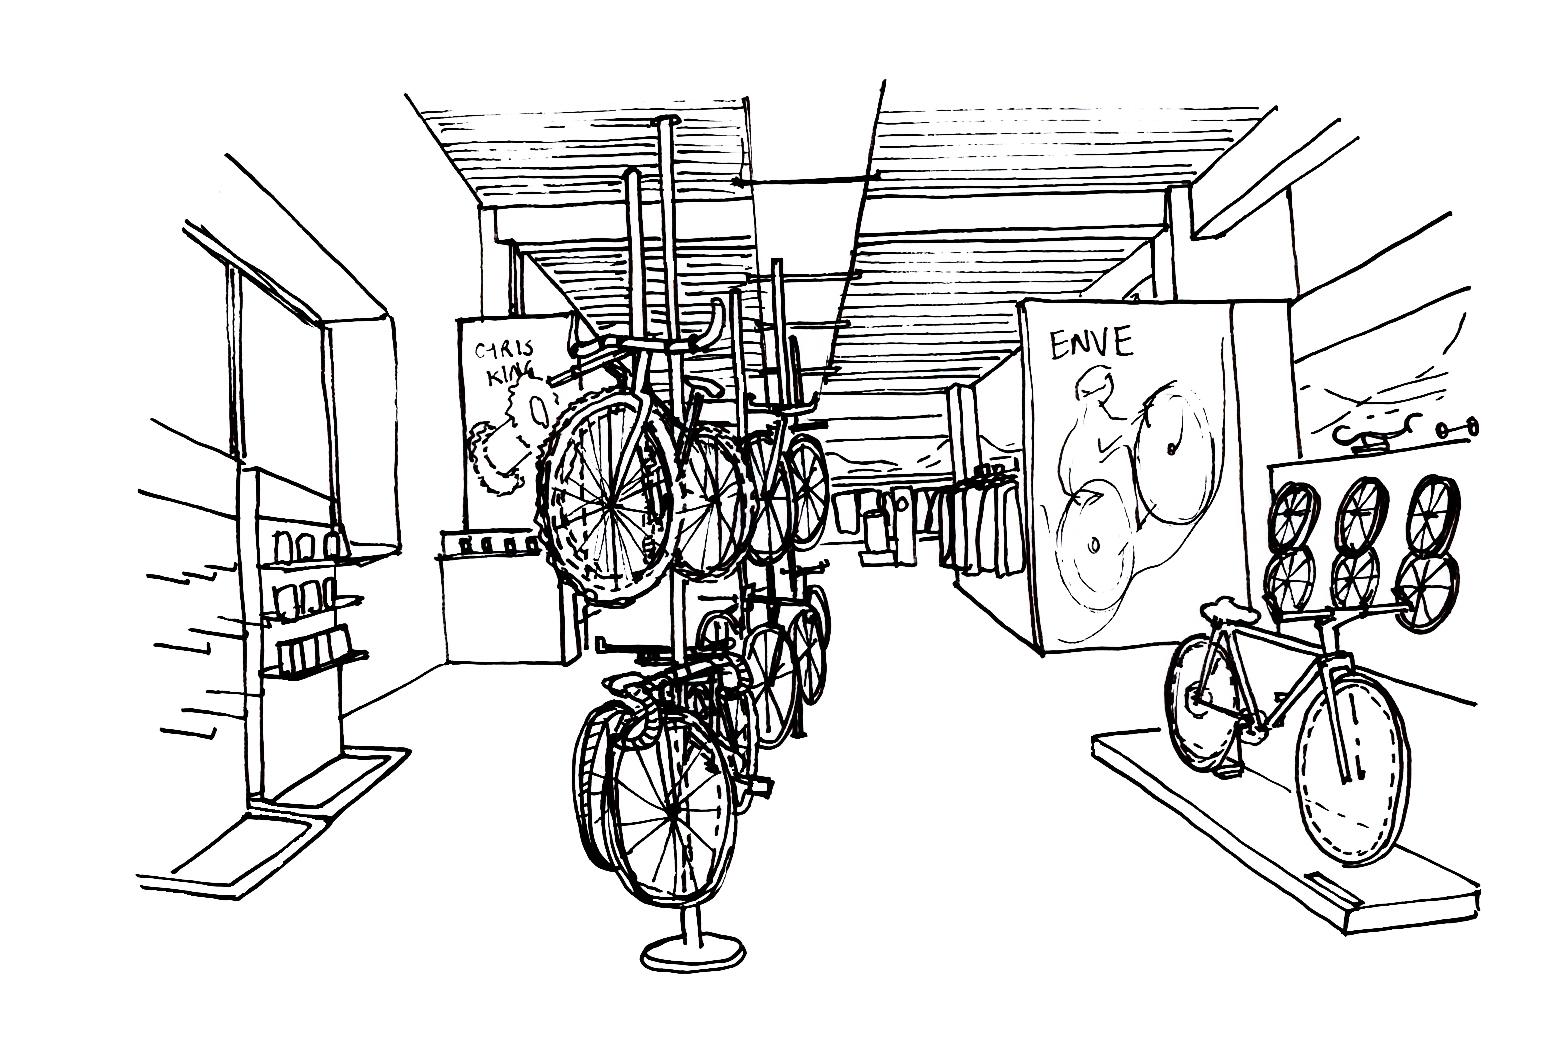 Saddleback Showroom Axo Sketch Outline.jpg